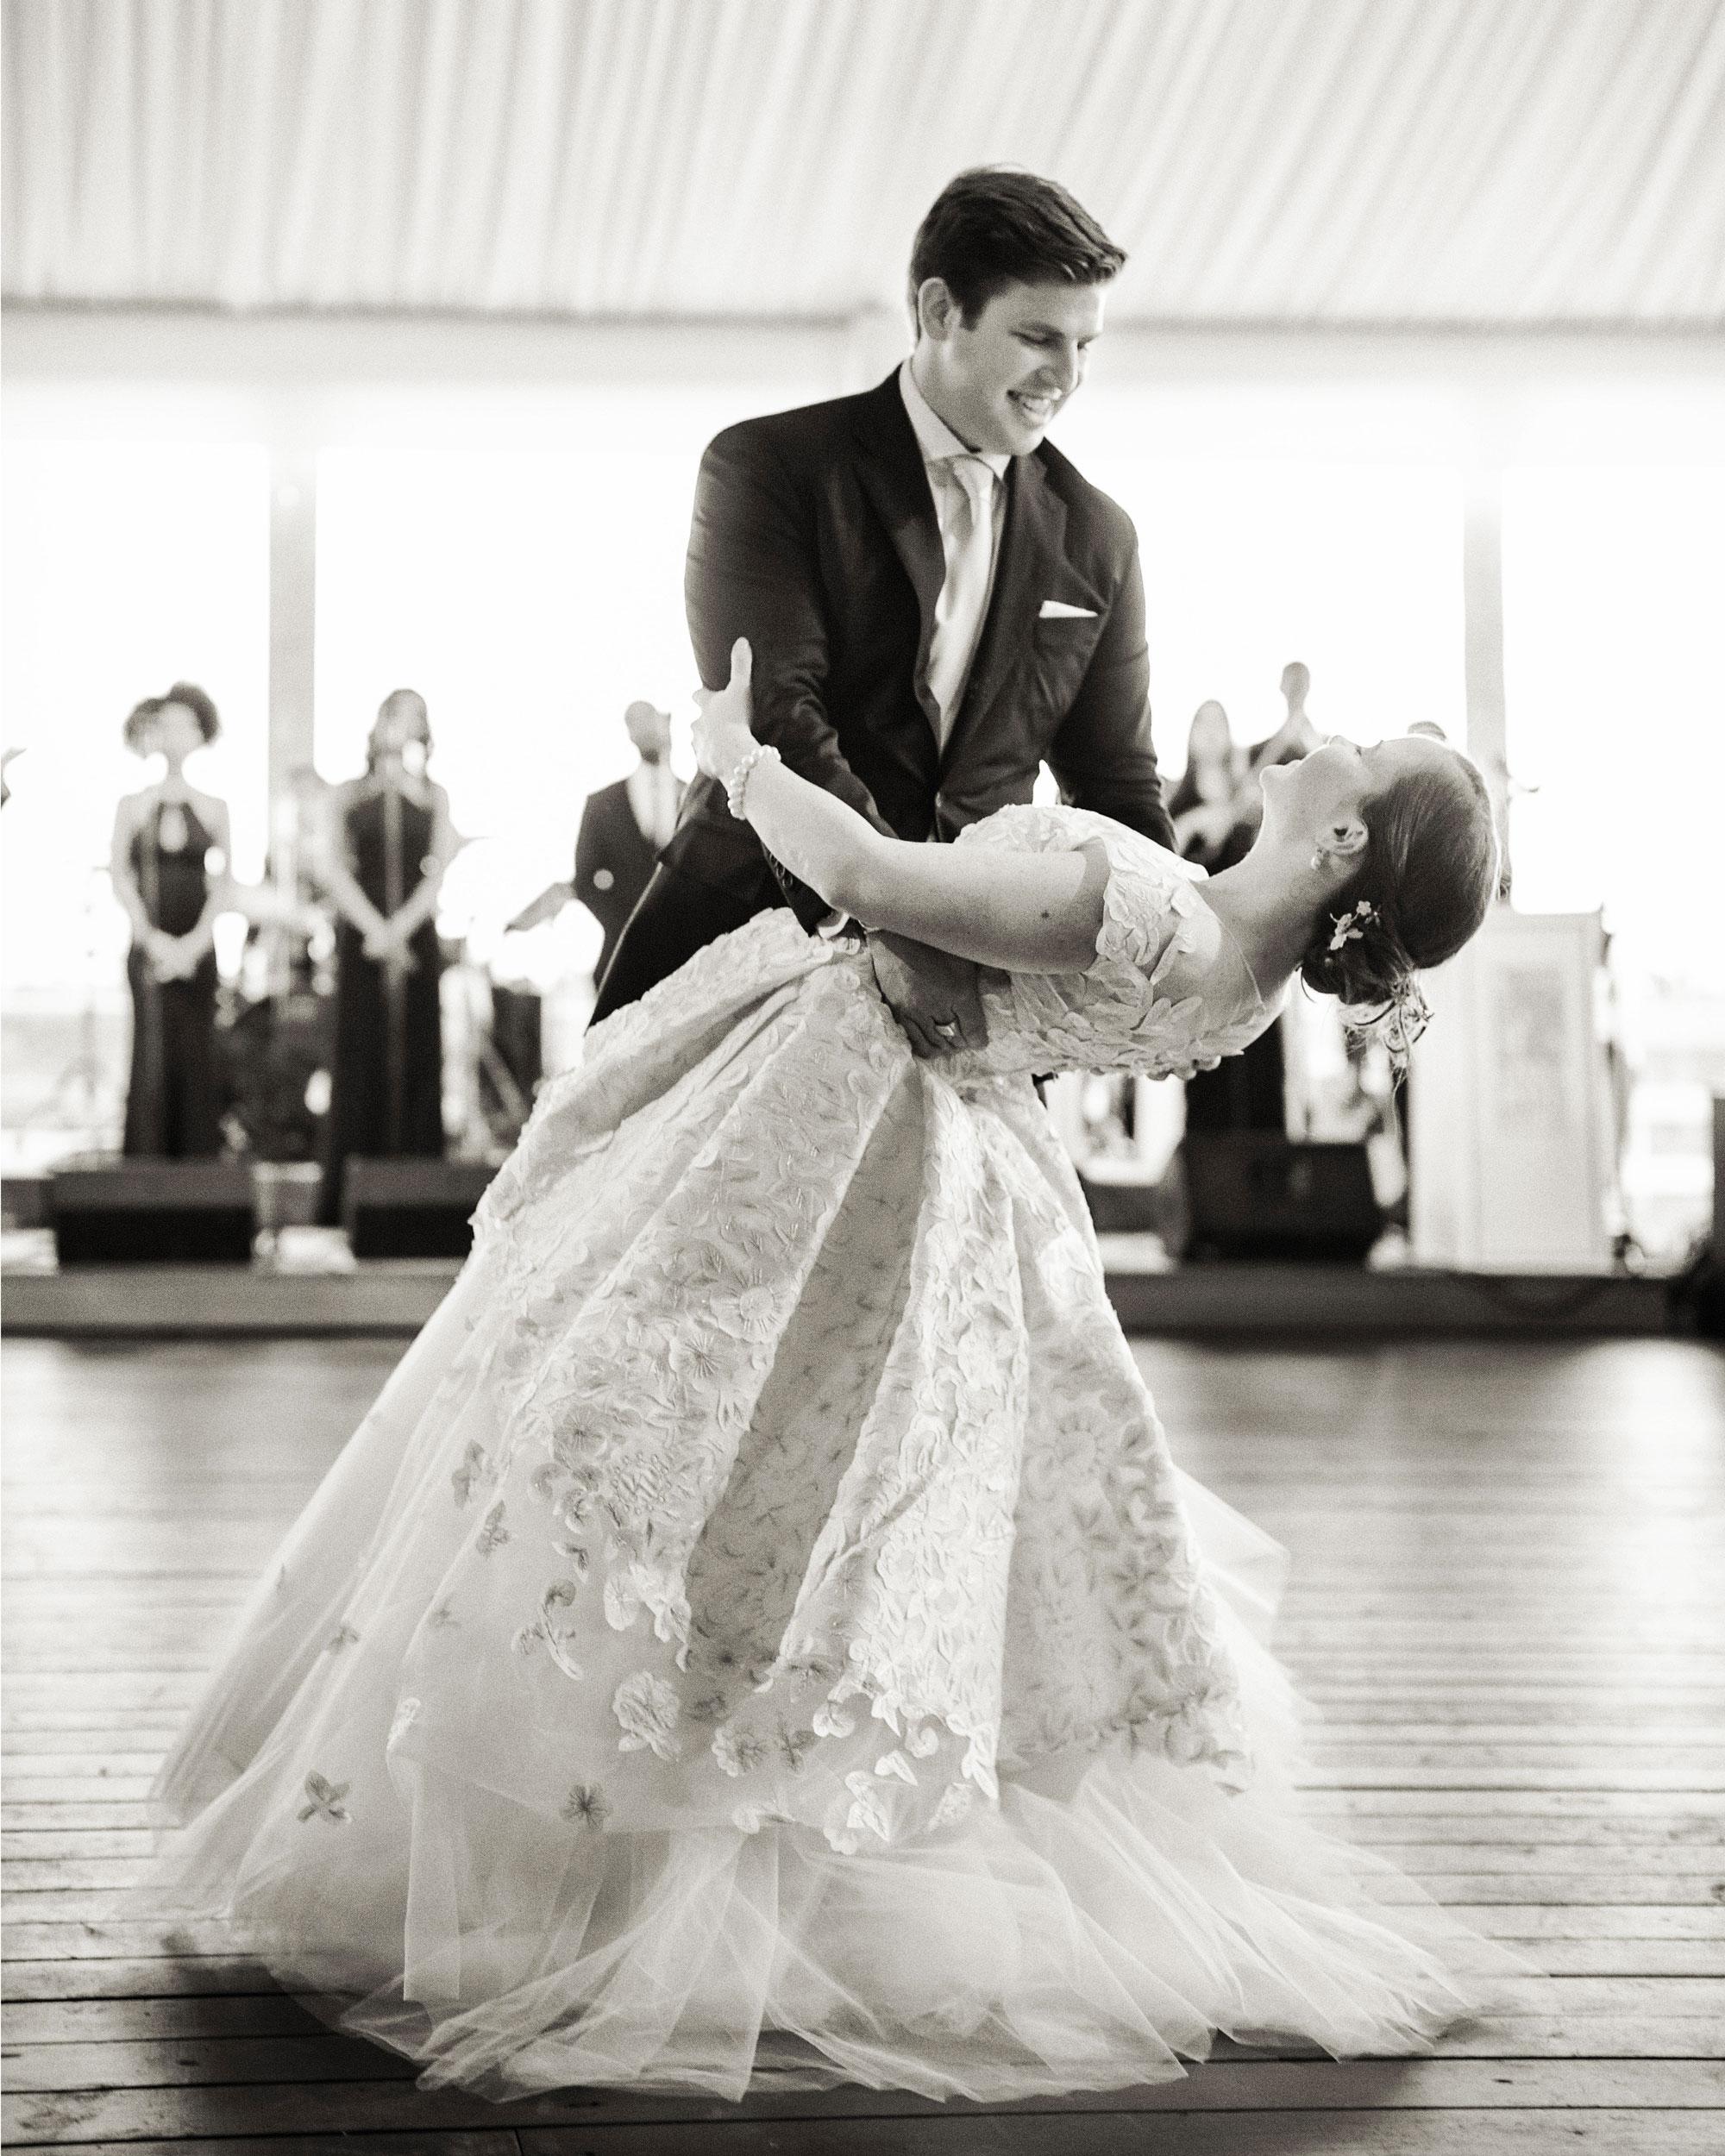 emily-matthew-wedding-firstdance-0168-s112720-0316.jpg